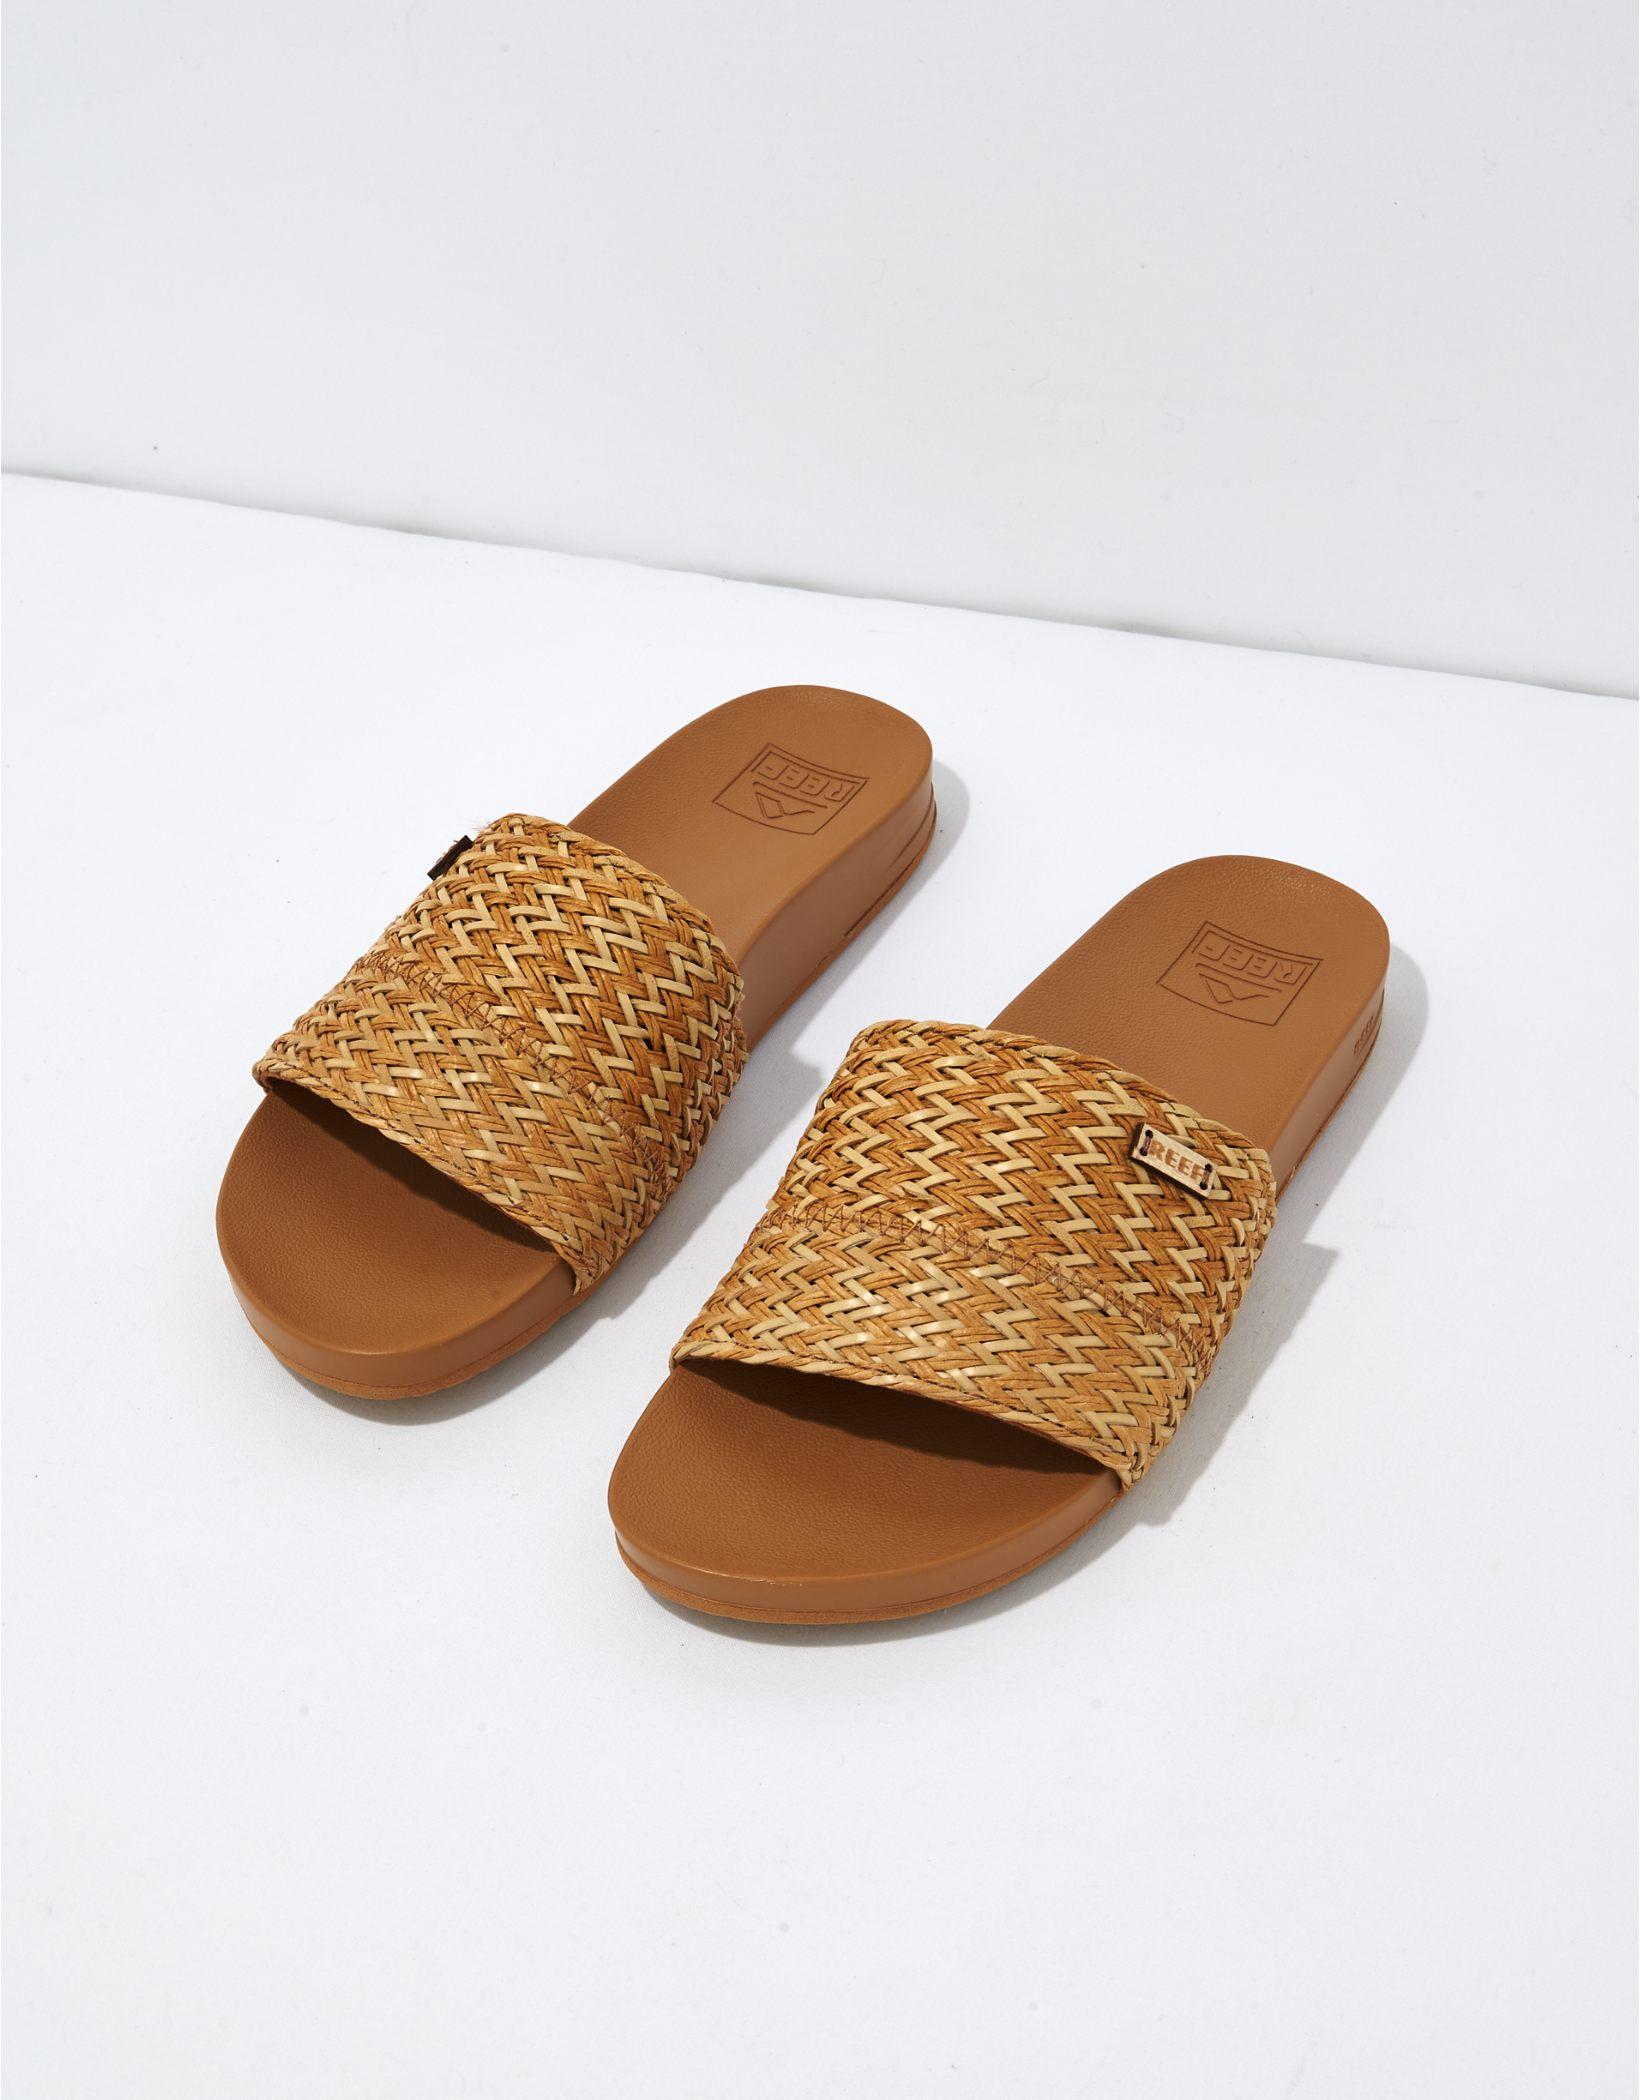 Reef Cushion Scout Braids Sandal